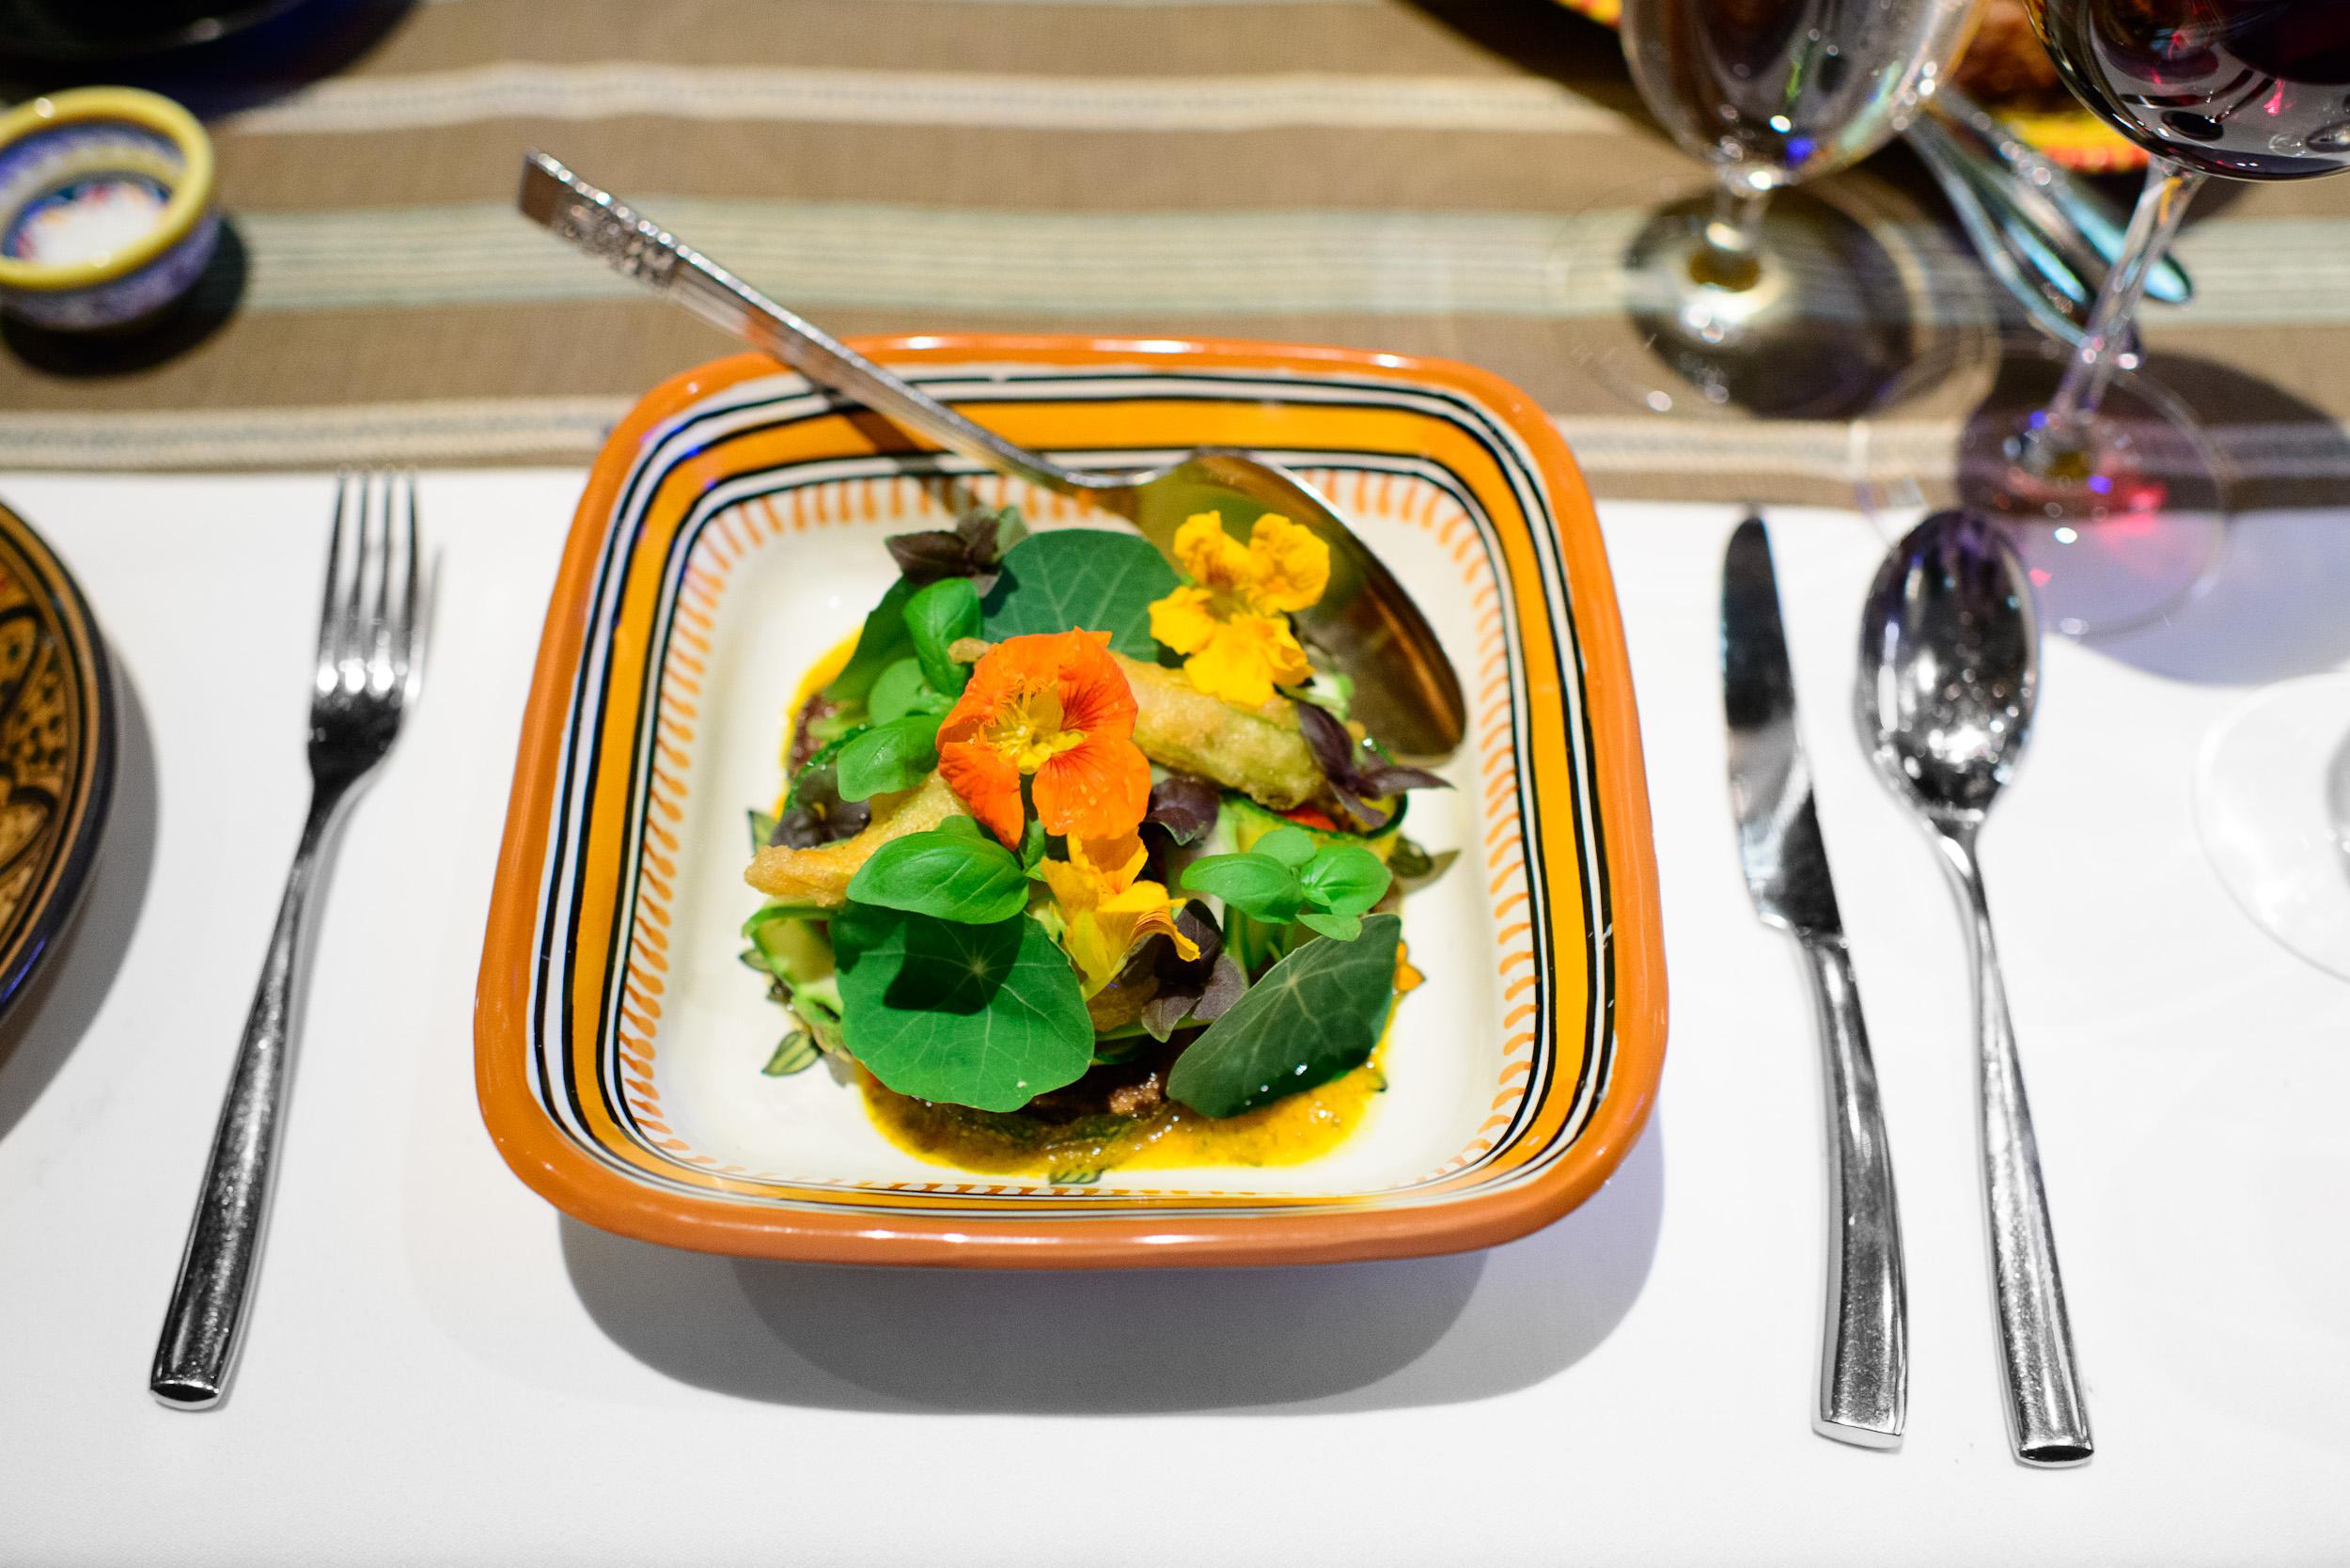 6th Course: Slices of zucchini and squash blossoms in a tomato v